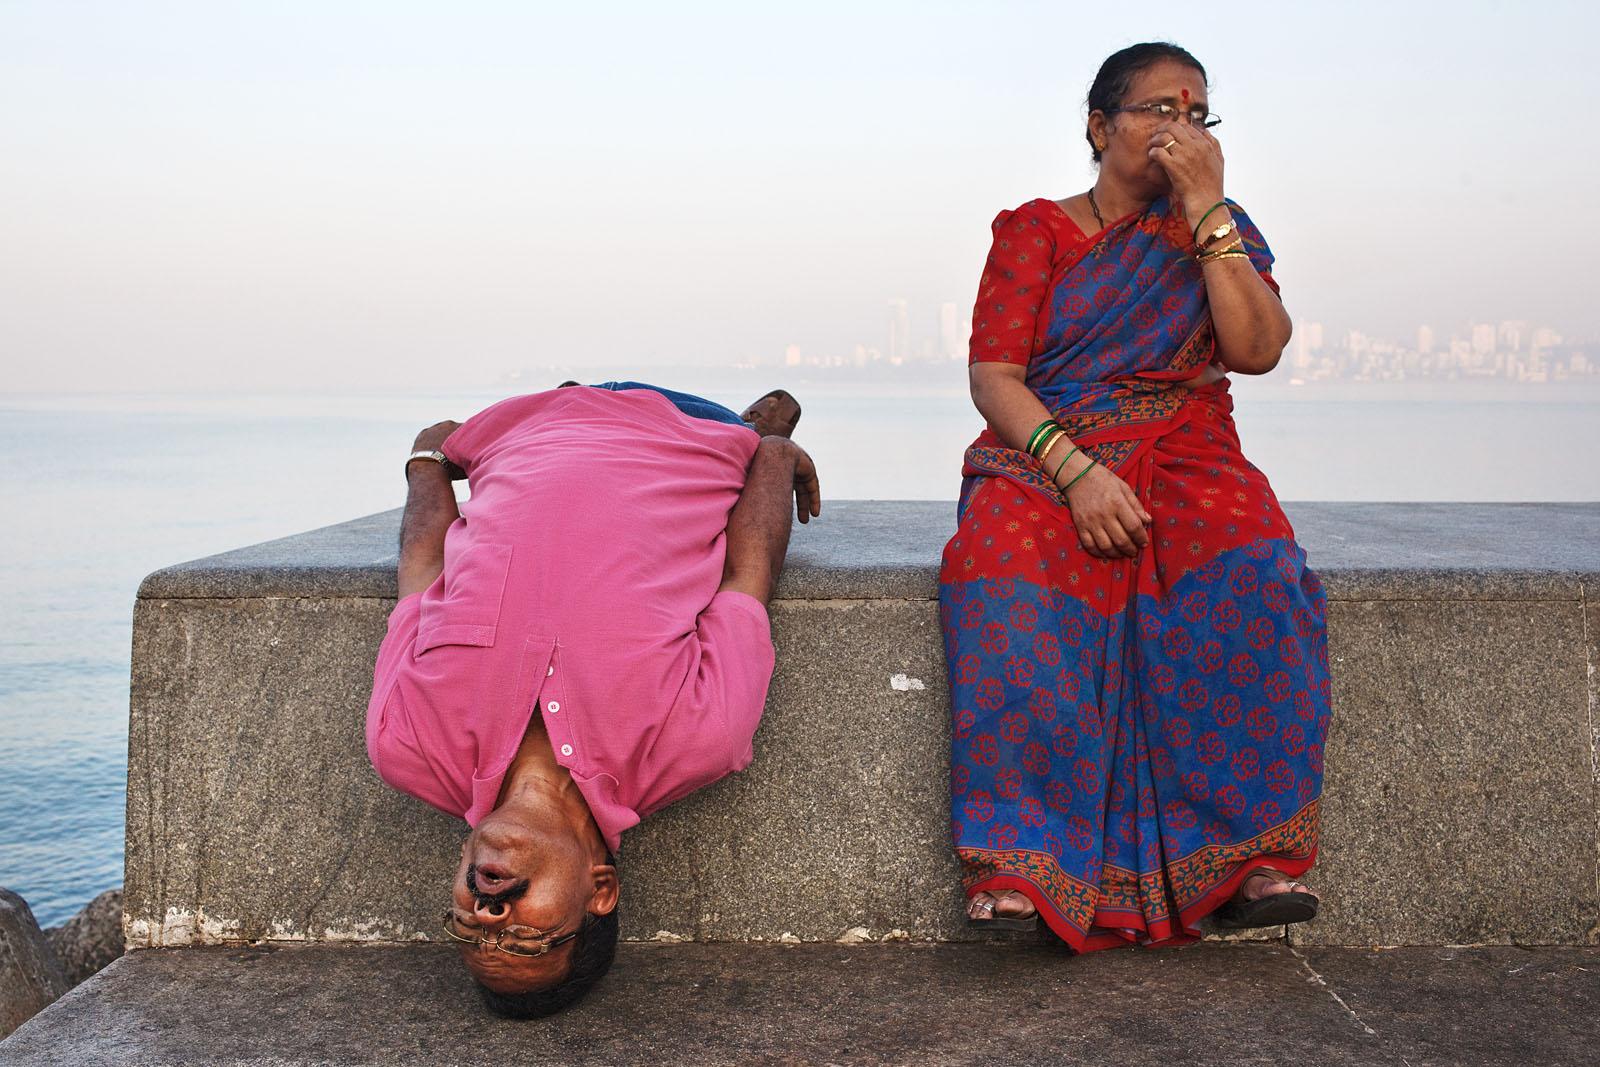 Mumbai, India, 2012